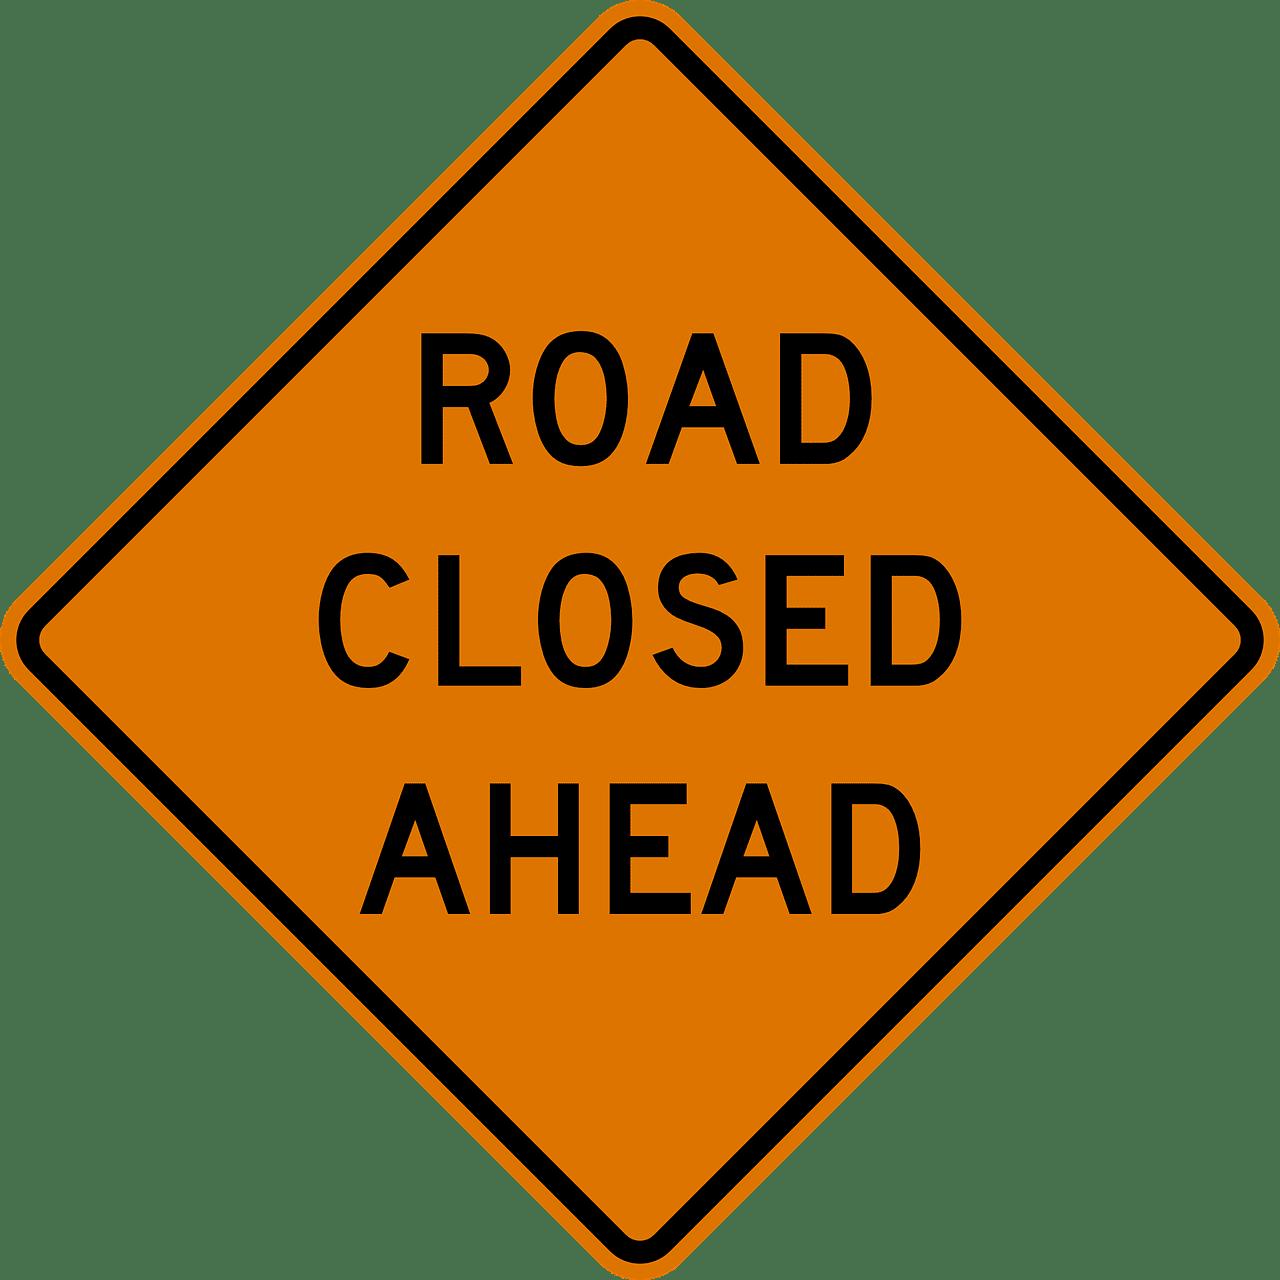 road-closed-traffic-sign